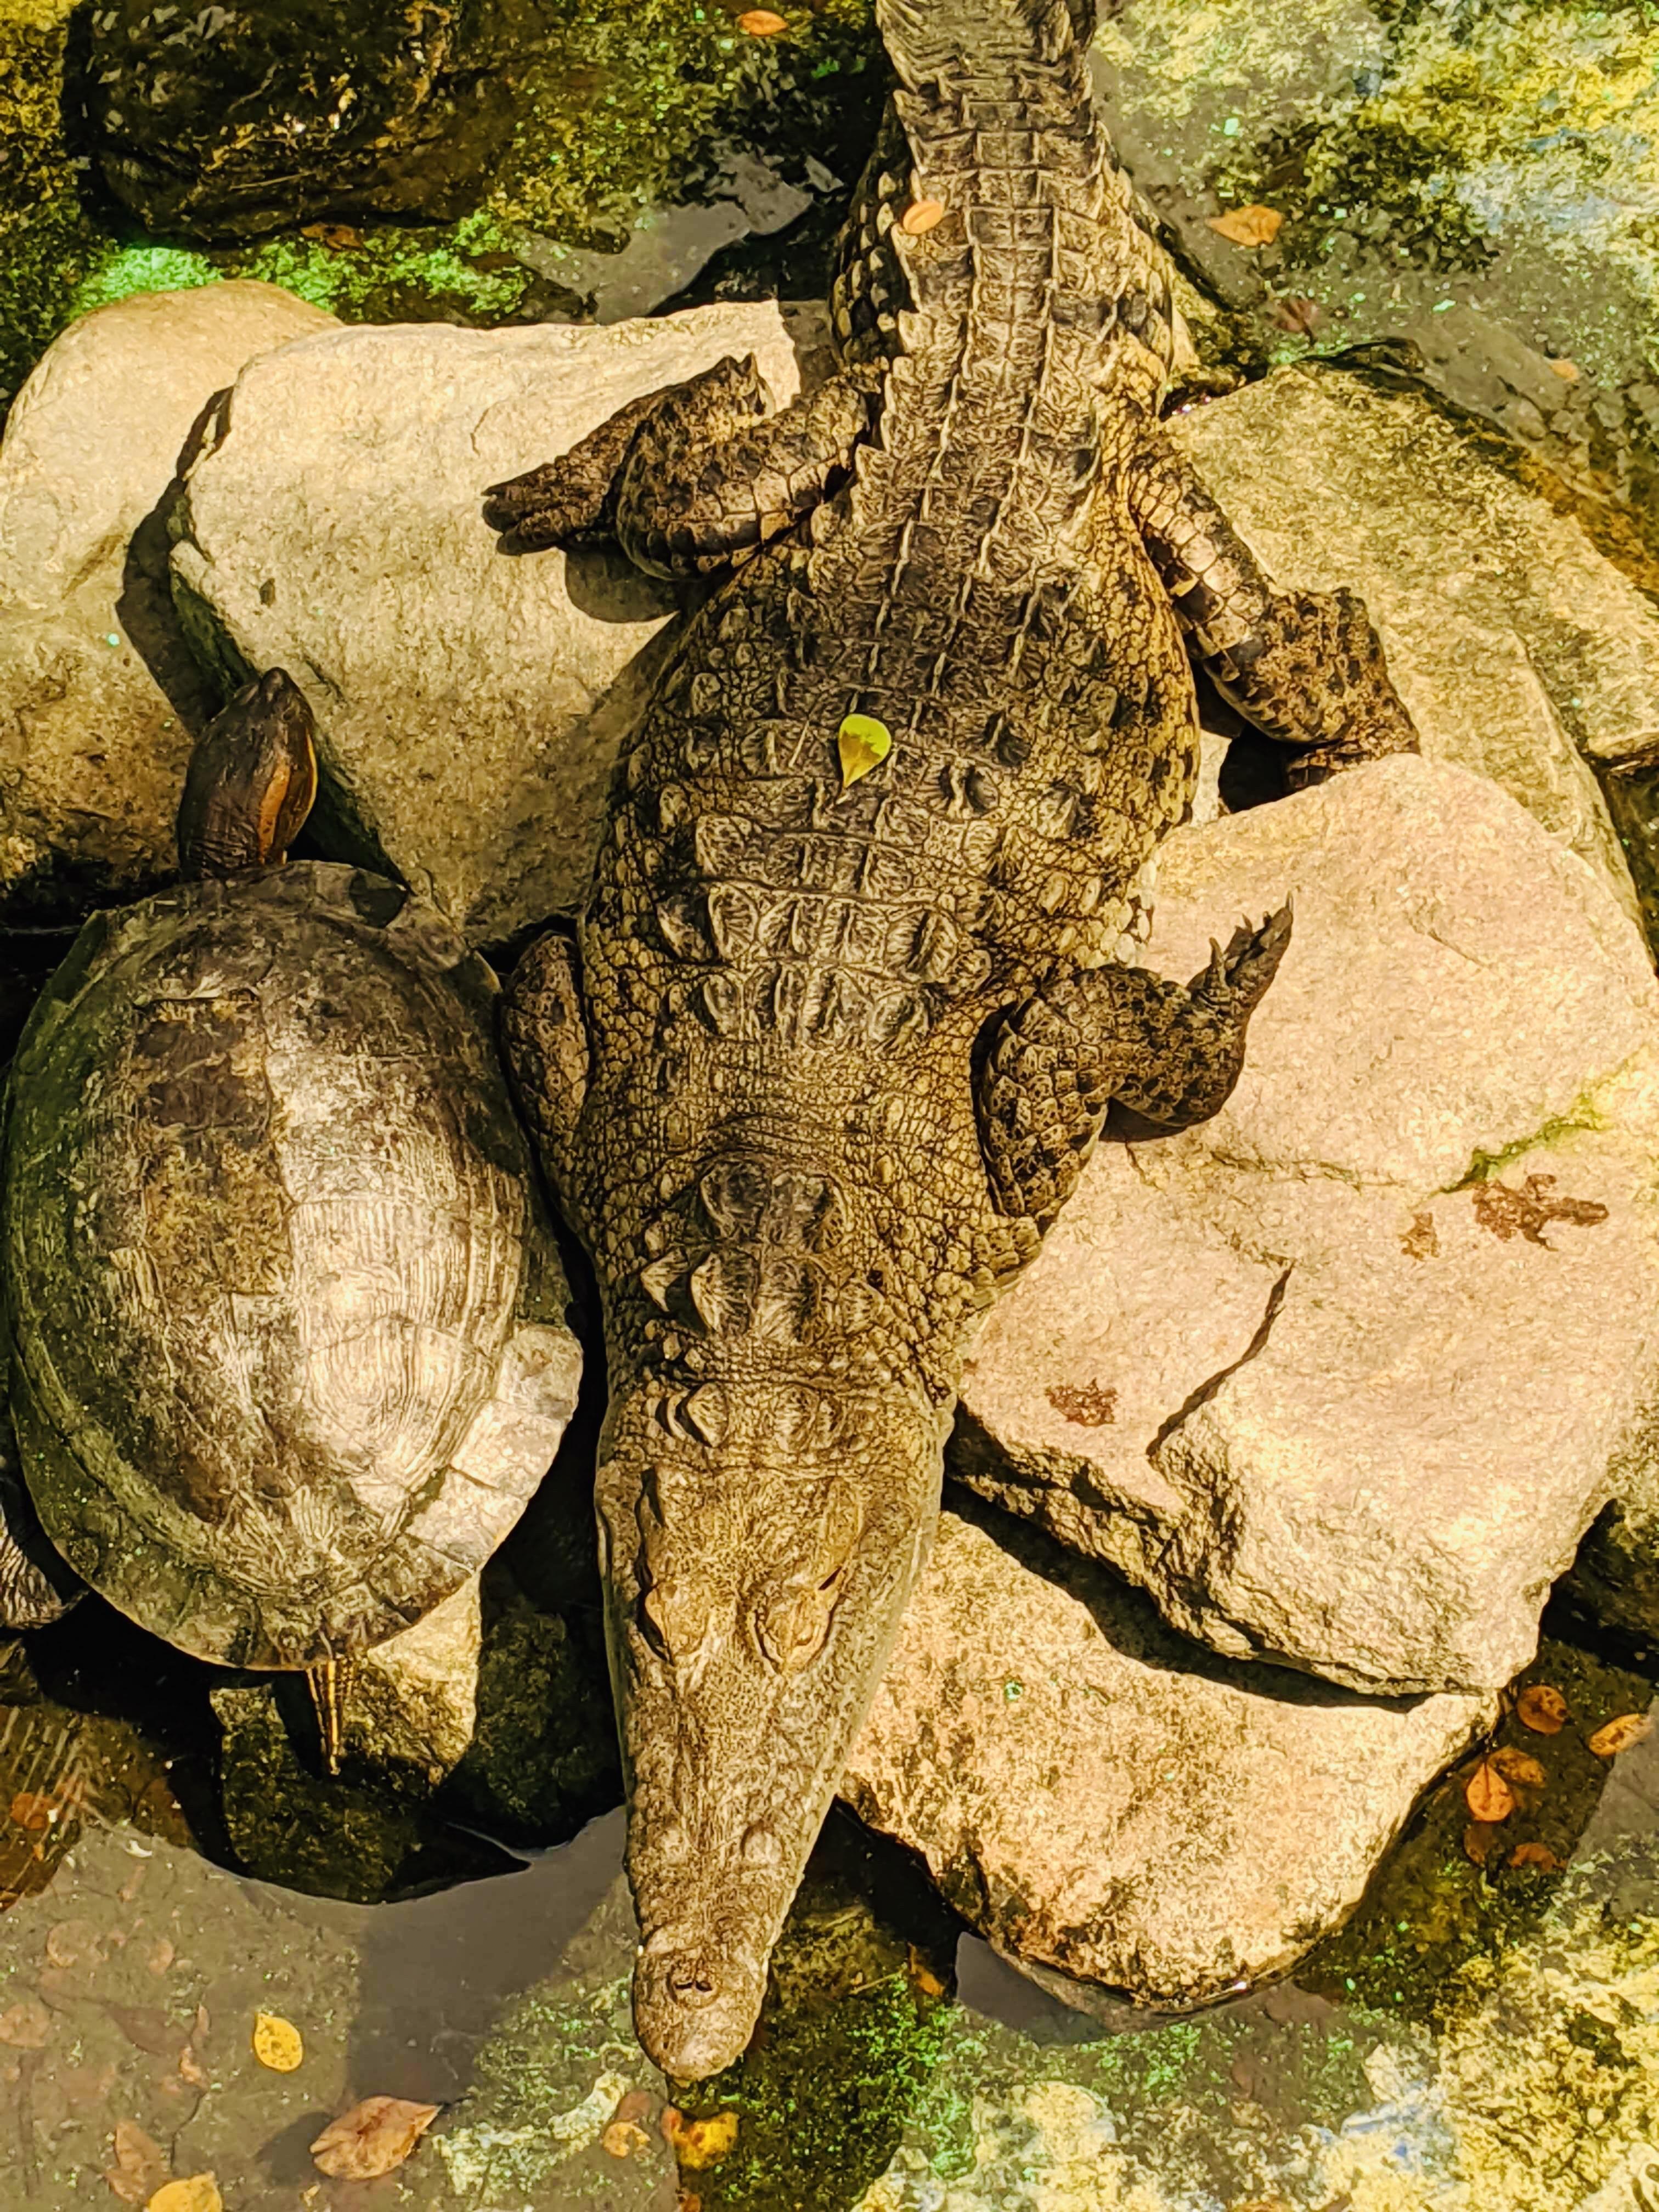 A crocodile on a rock with a turtle beside it